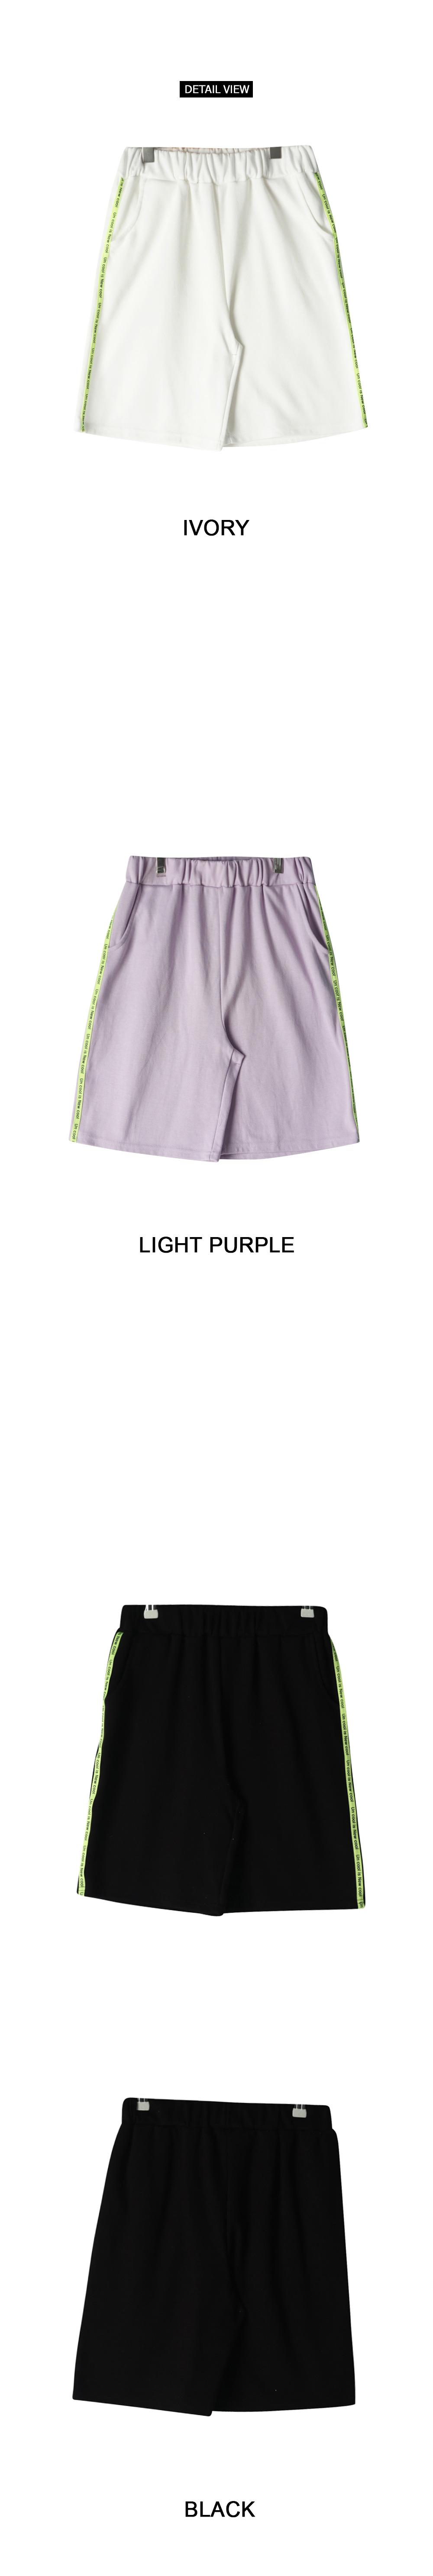 New Cool Line Short Pants